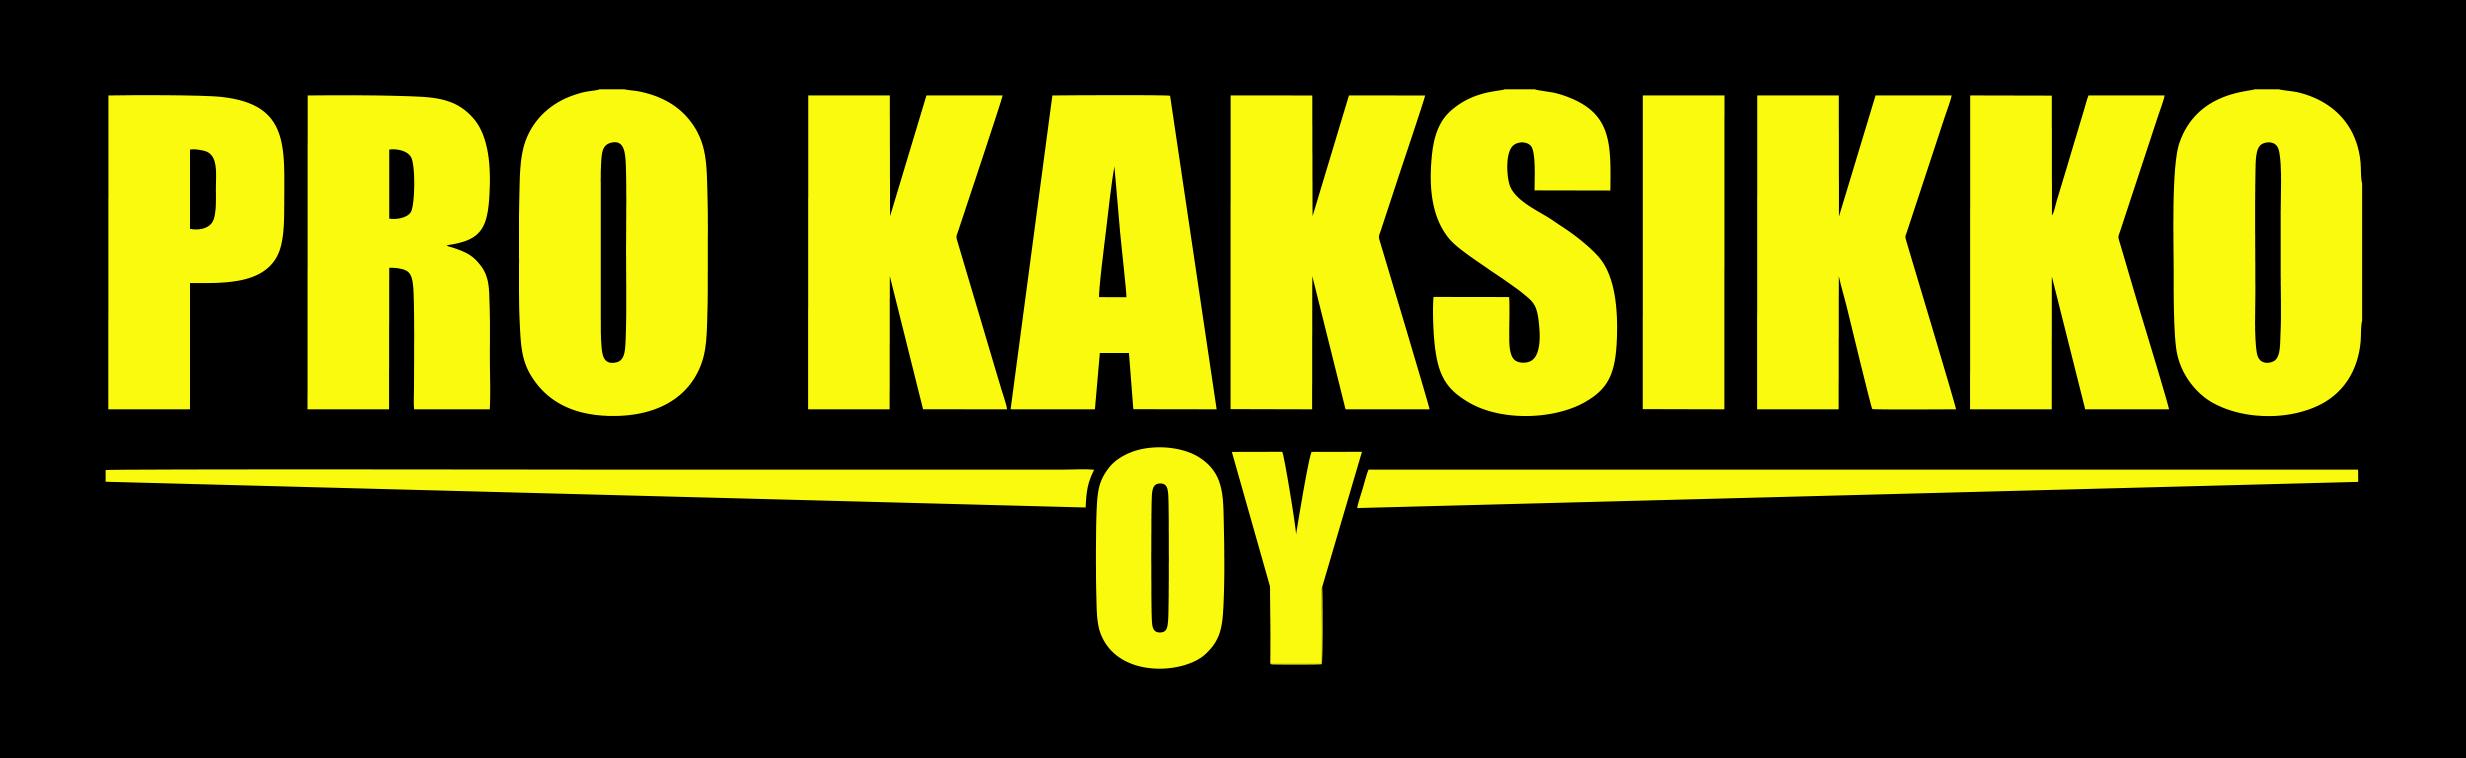 Pro Kaksikko Oy